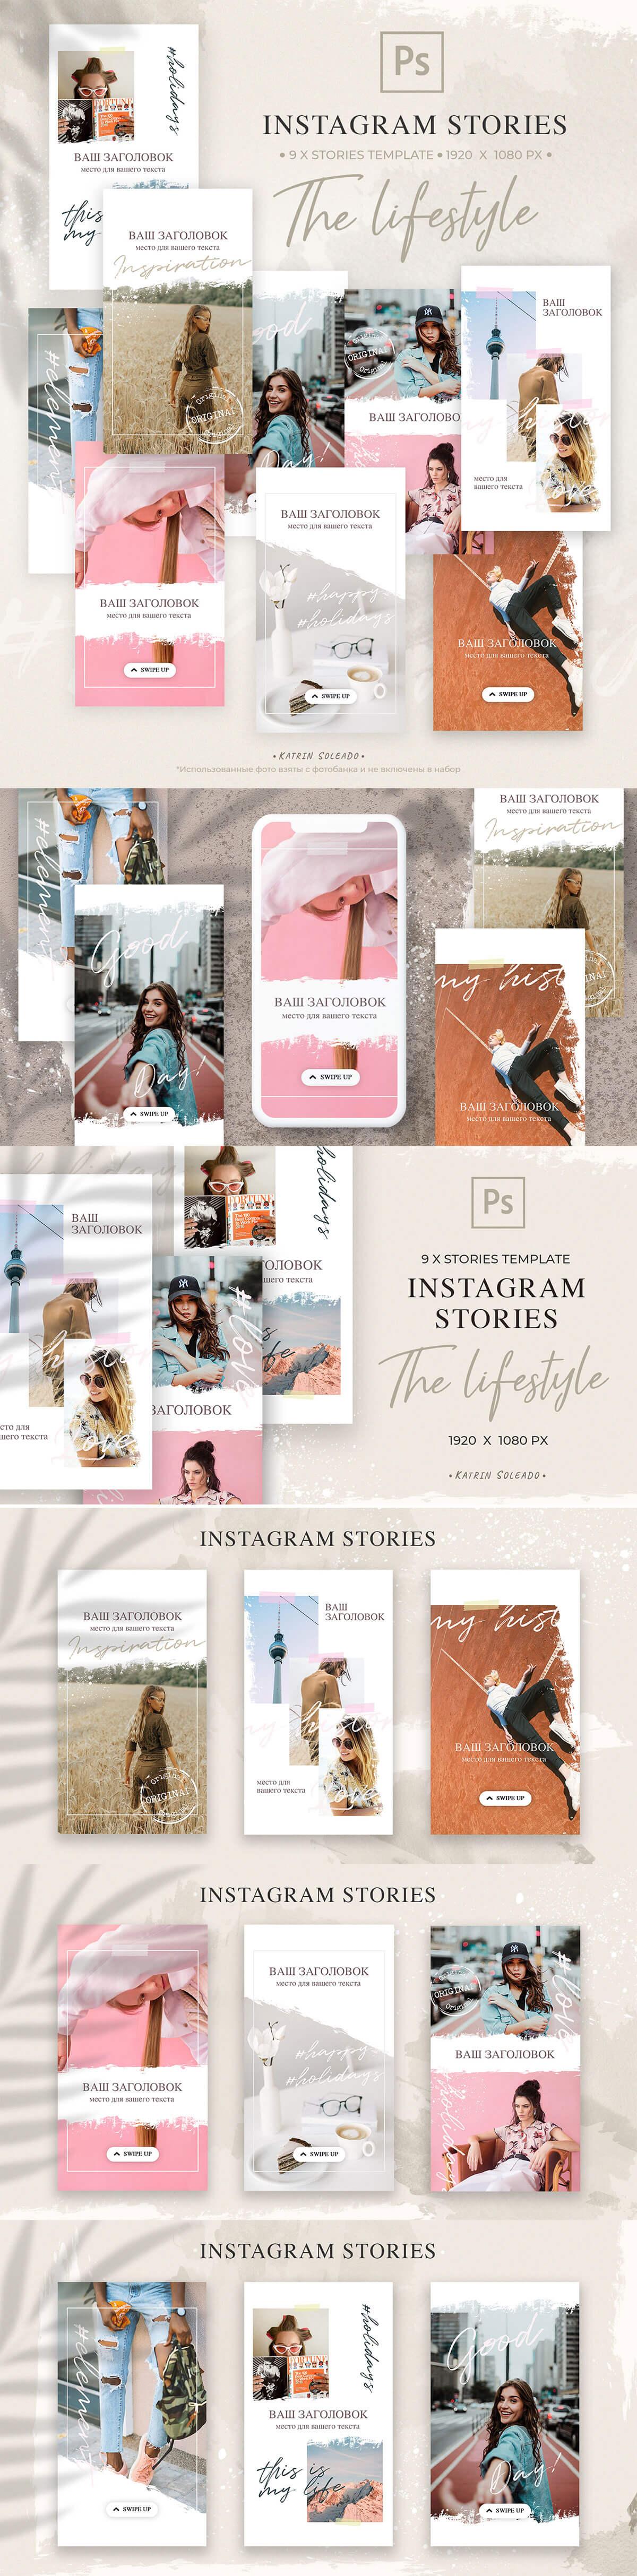 Free Modern Instagram Stories Templates